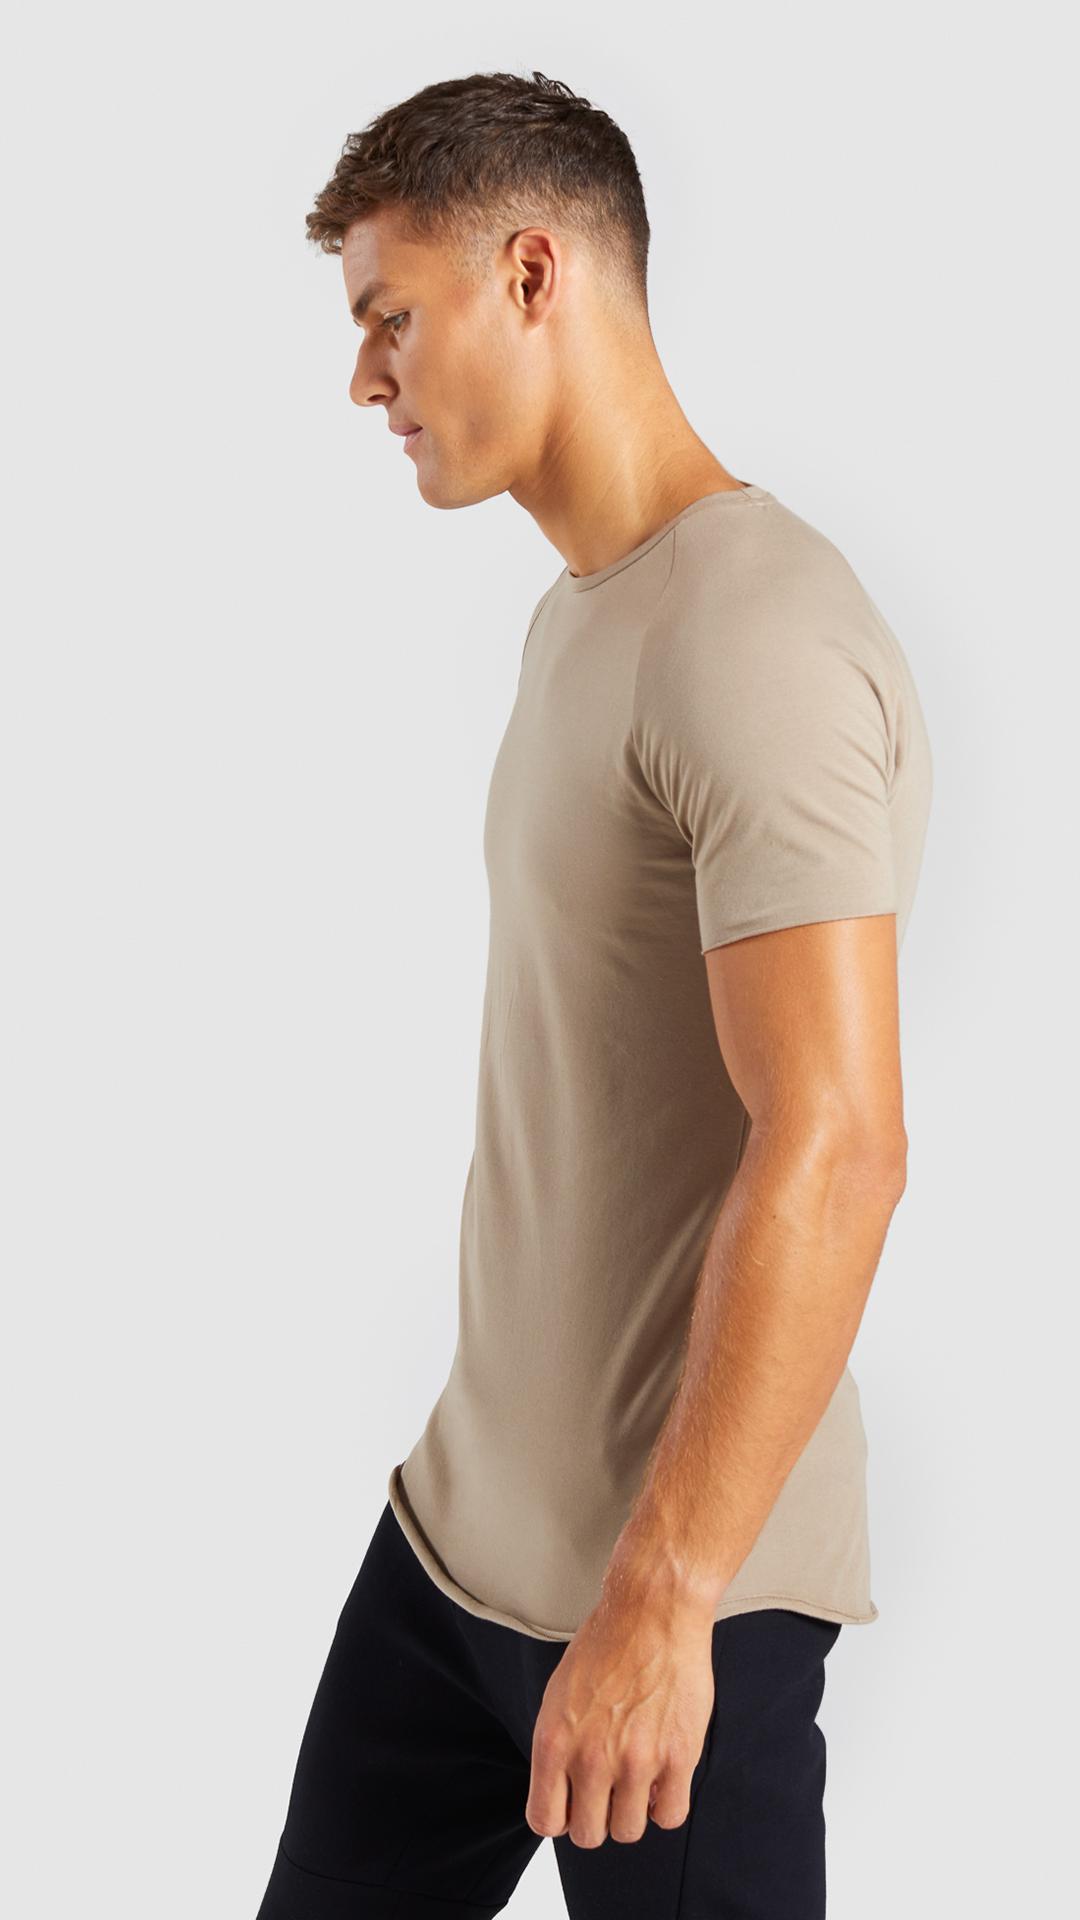 11991f21c247be The Eaze Sleeveless T-Shirt